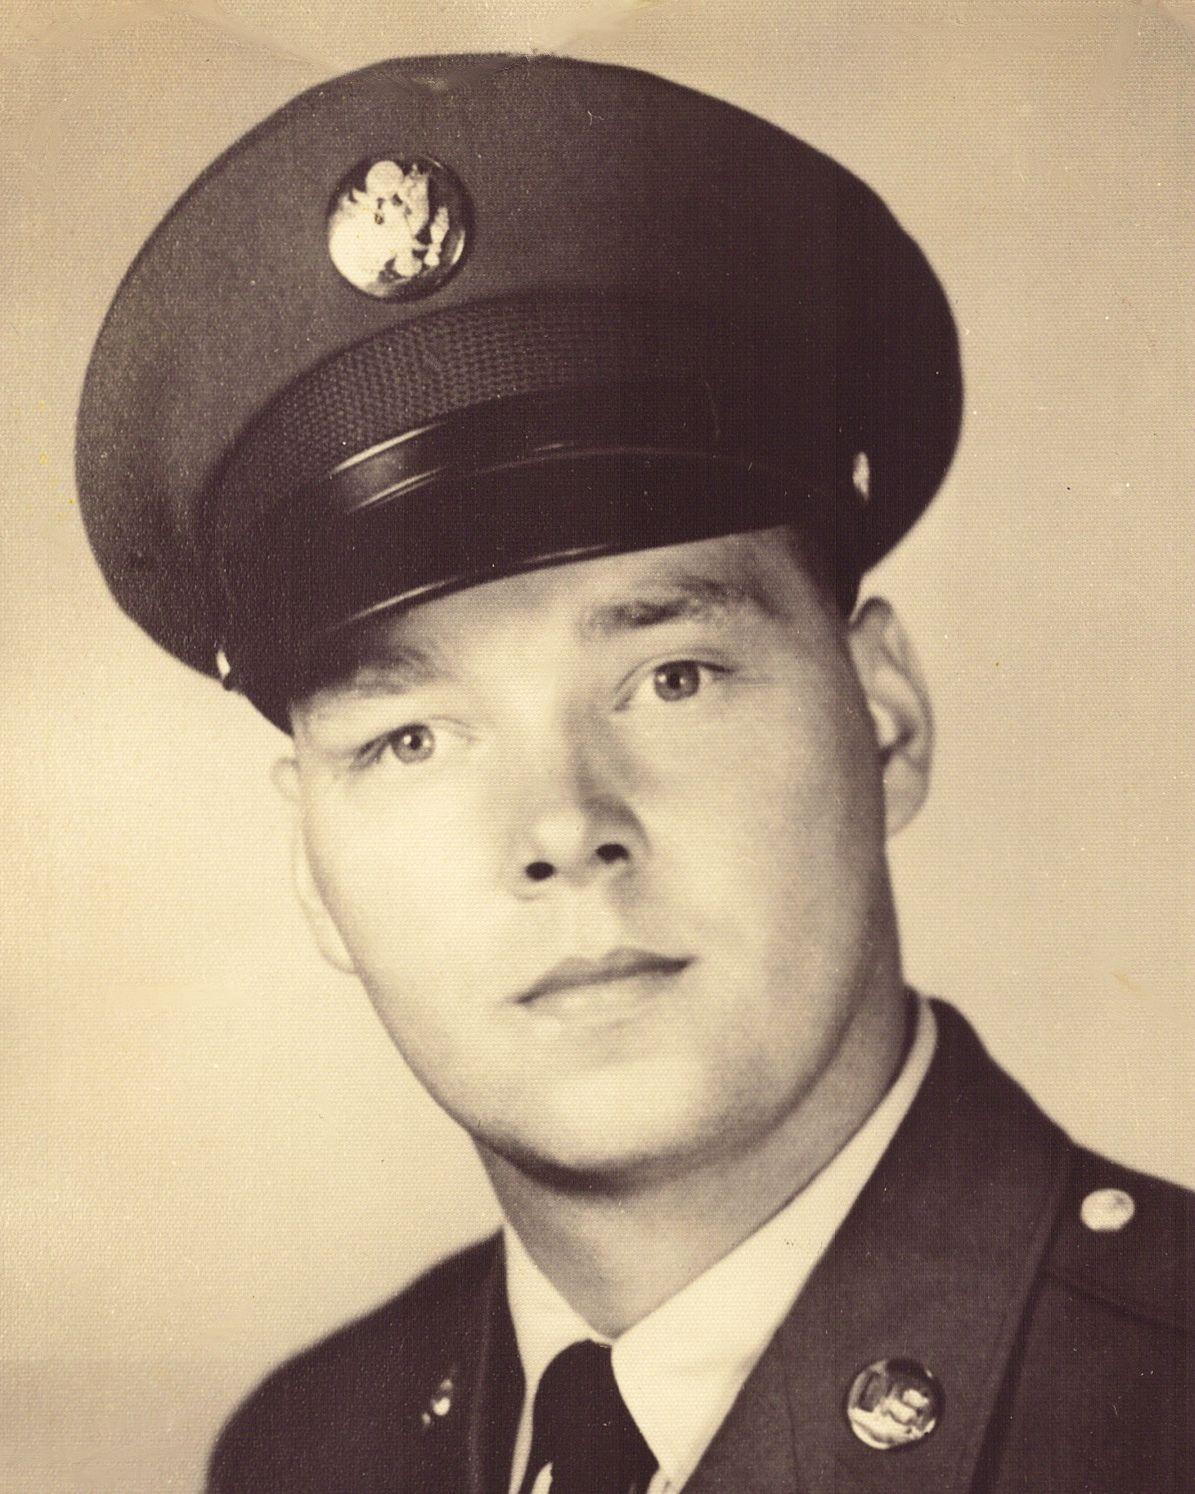 Portrait of Jack Denver Casto